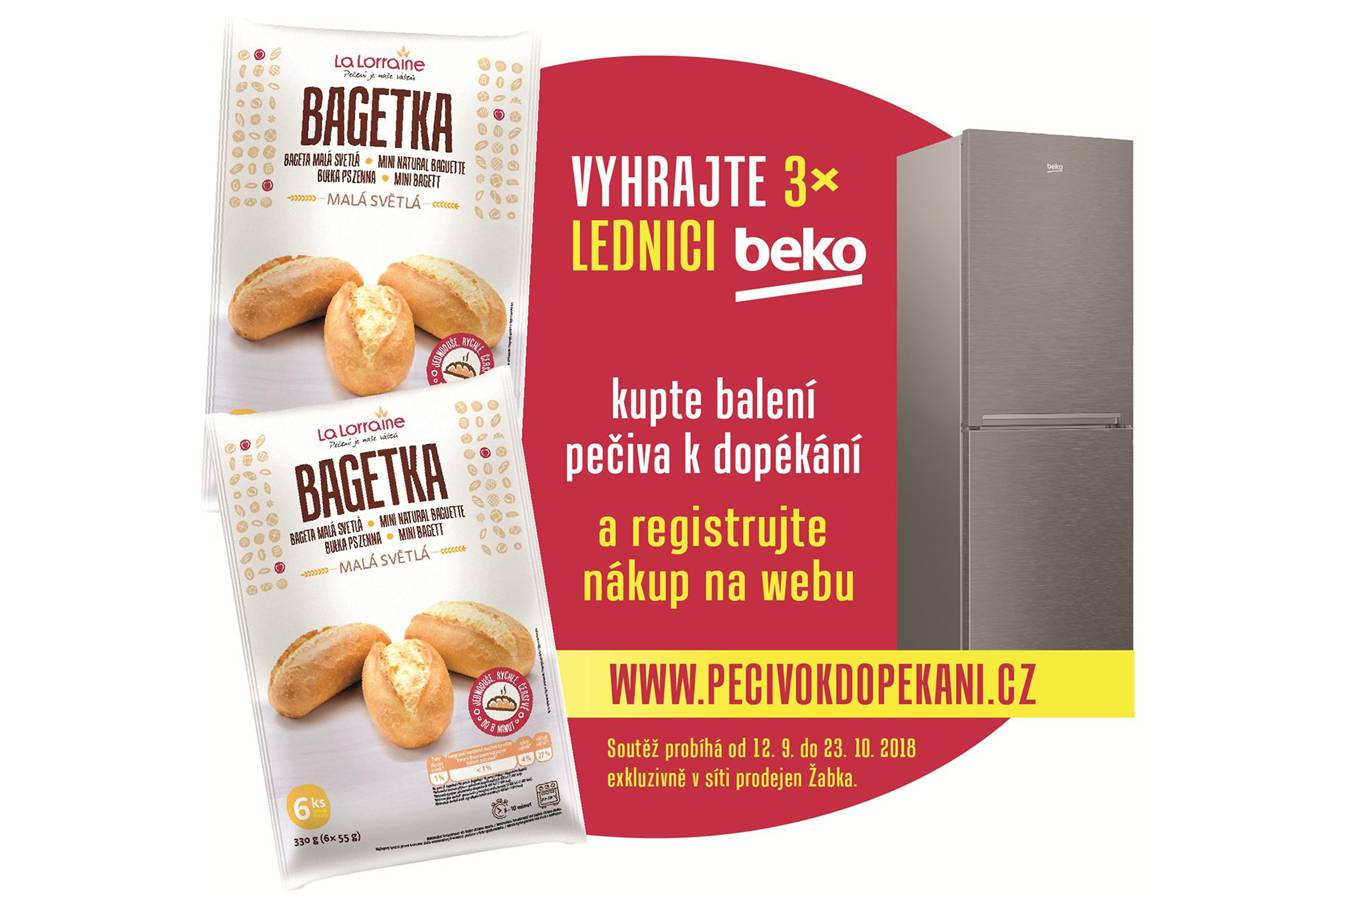 VYHRAJ LEDNIČKU S DOPÉKACÍM PEČIVEM LA LORRAINE - www.pecivokdopekani.cz